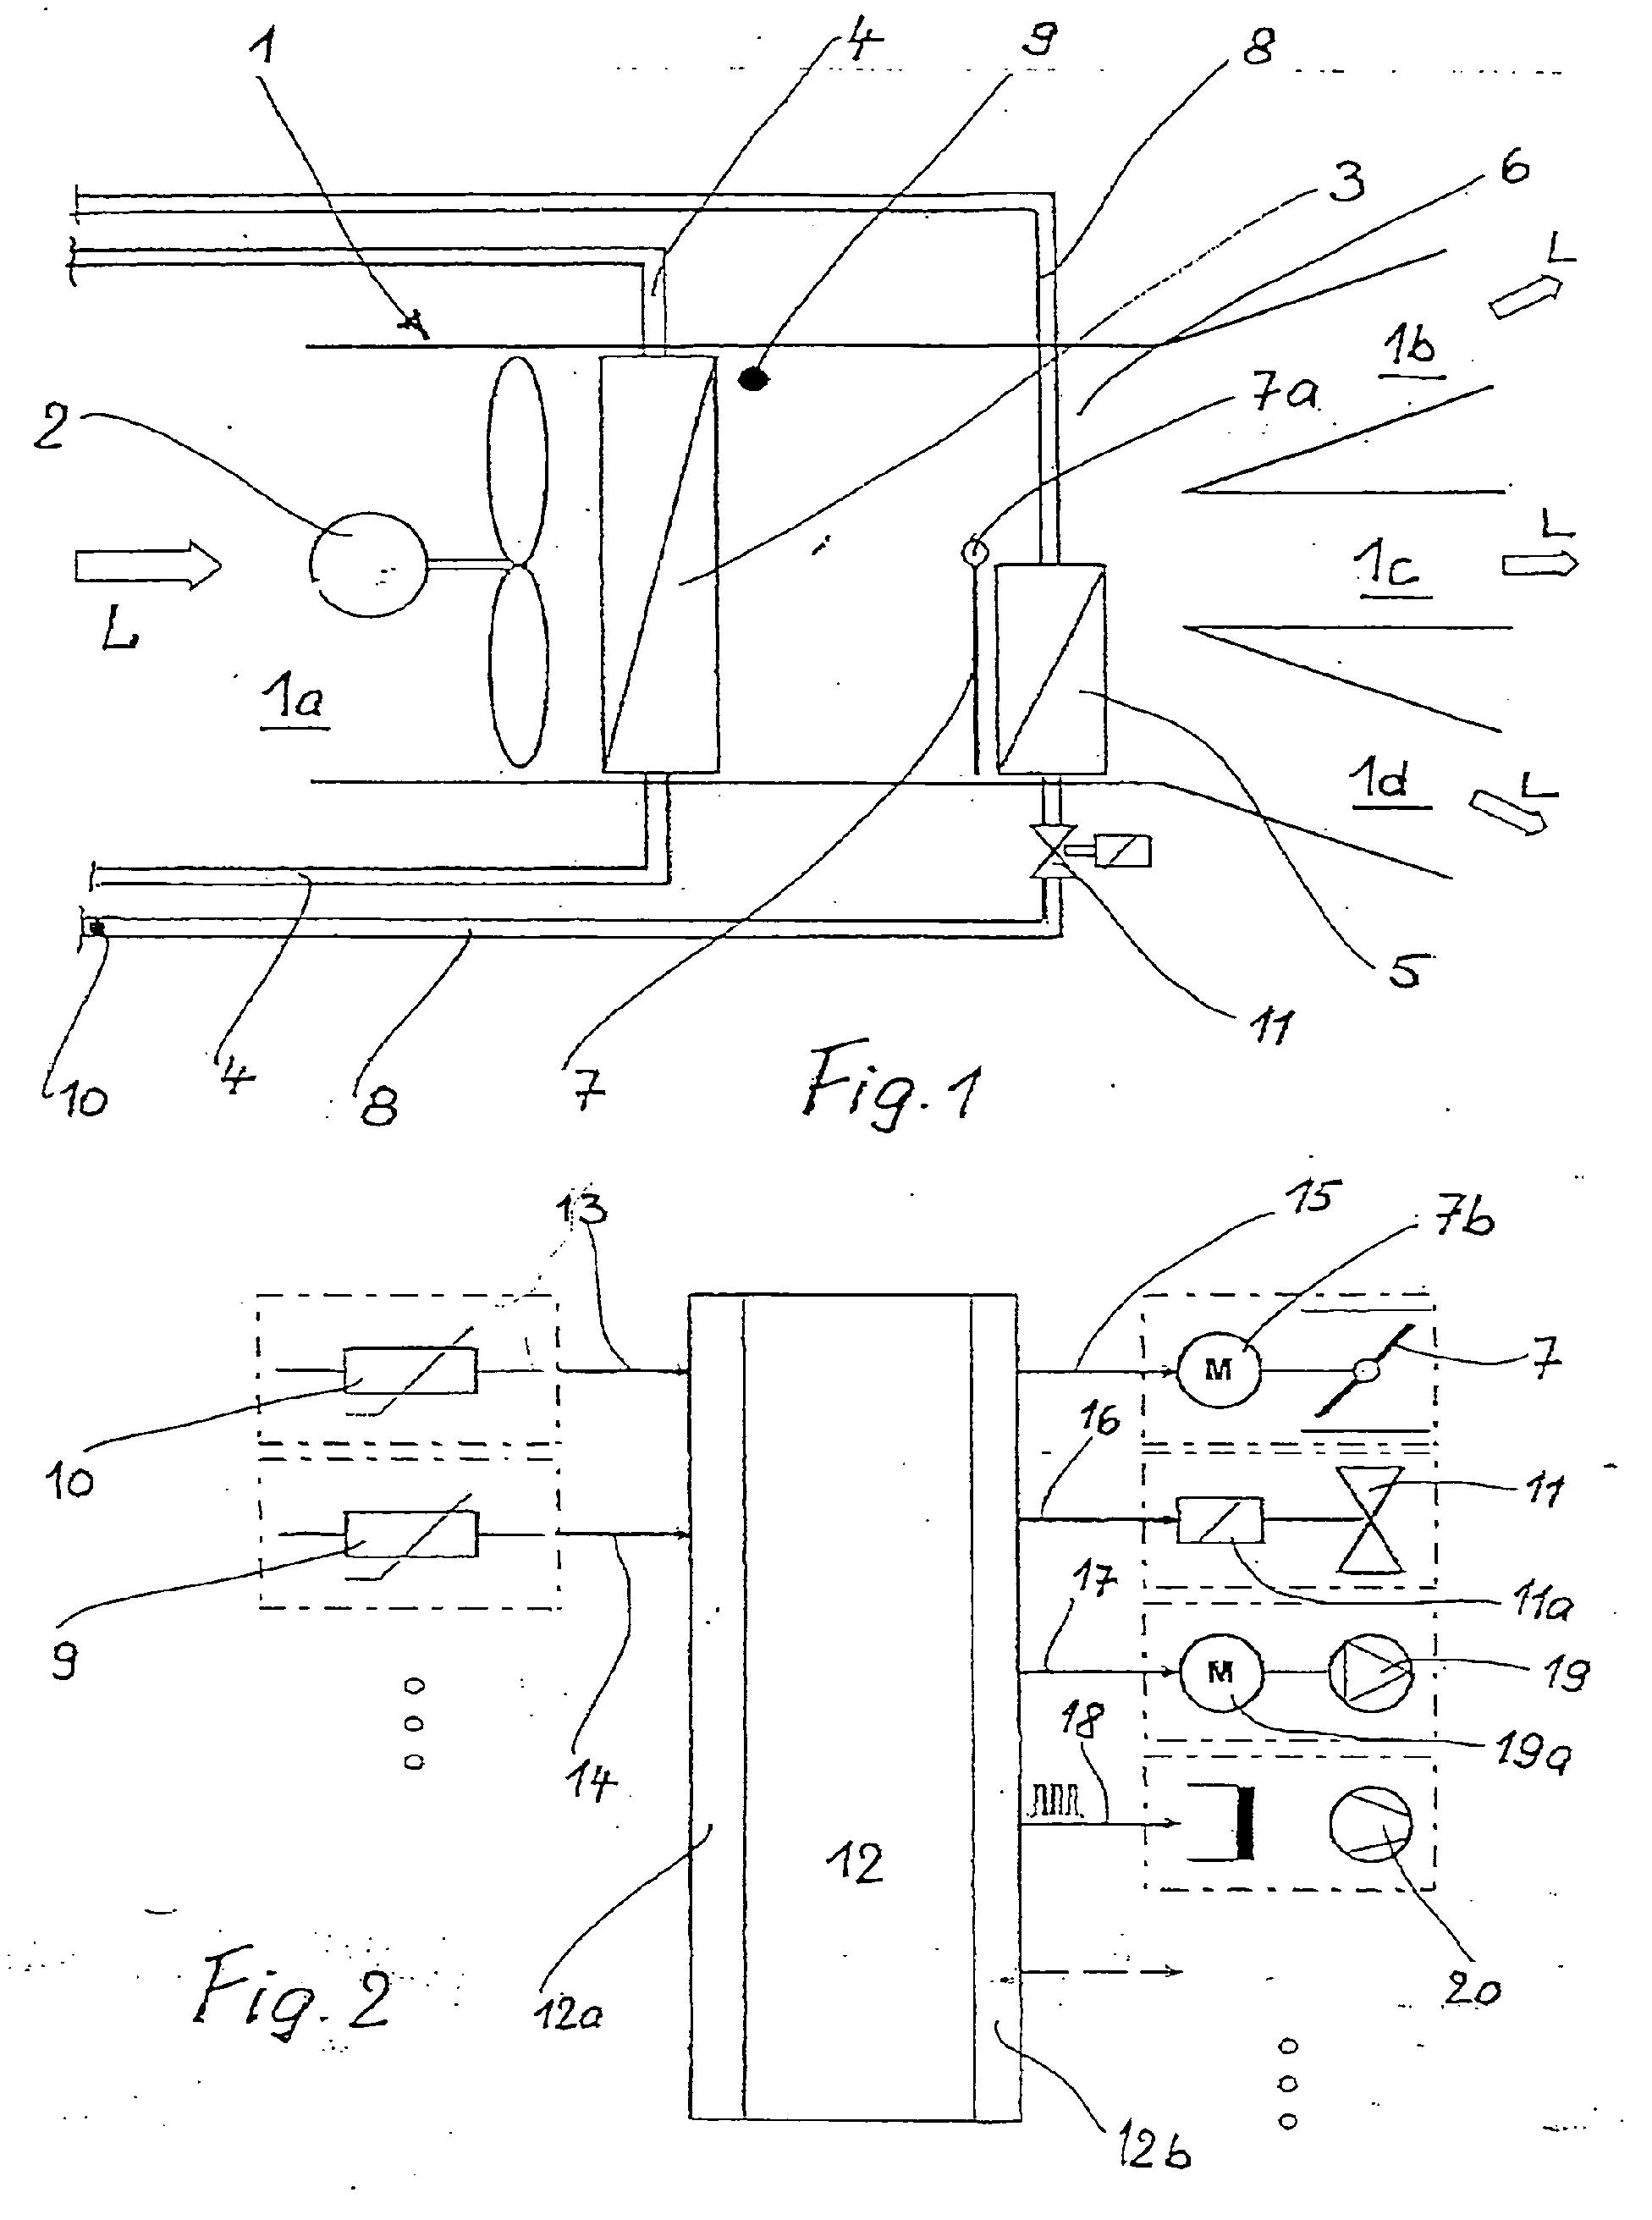 lufttemperatur klimaanlage automobil bau auto systeme. Black Bedroom Furniture Sets. Home Design Ideas